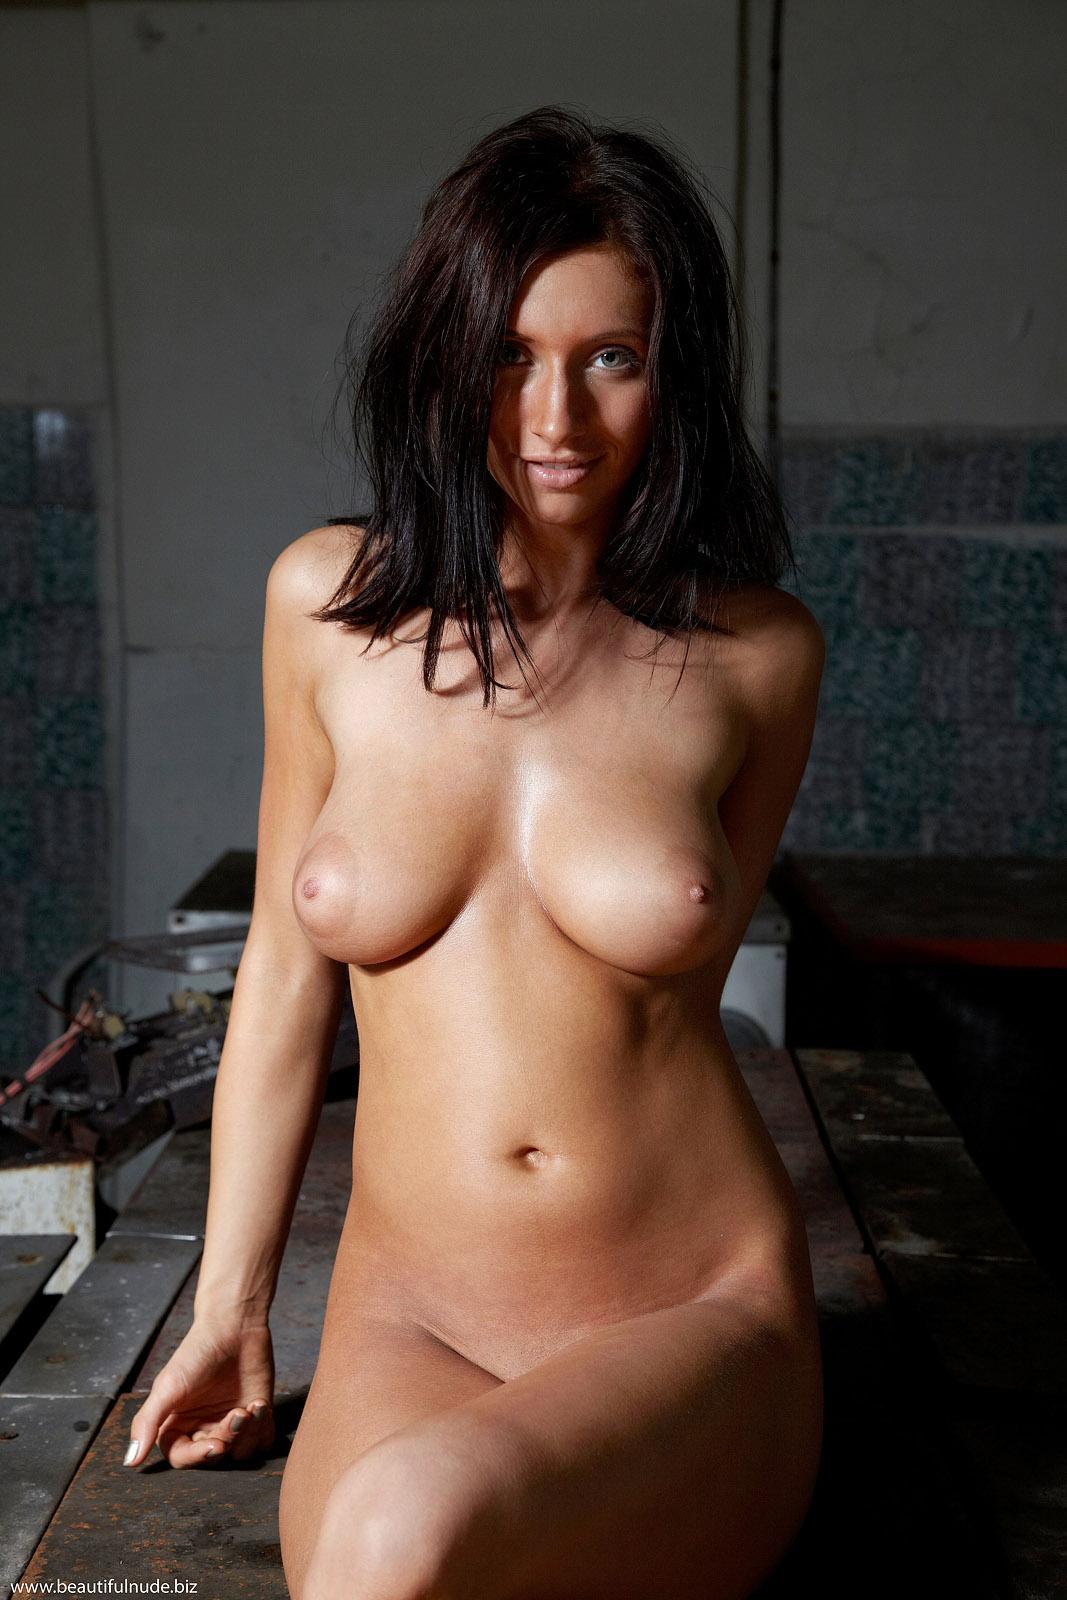 Nadia Nude - NudesPuri.com